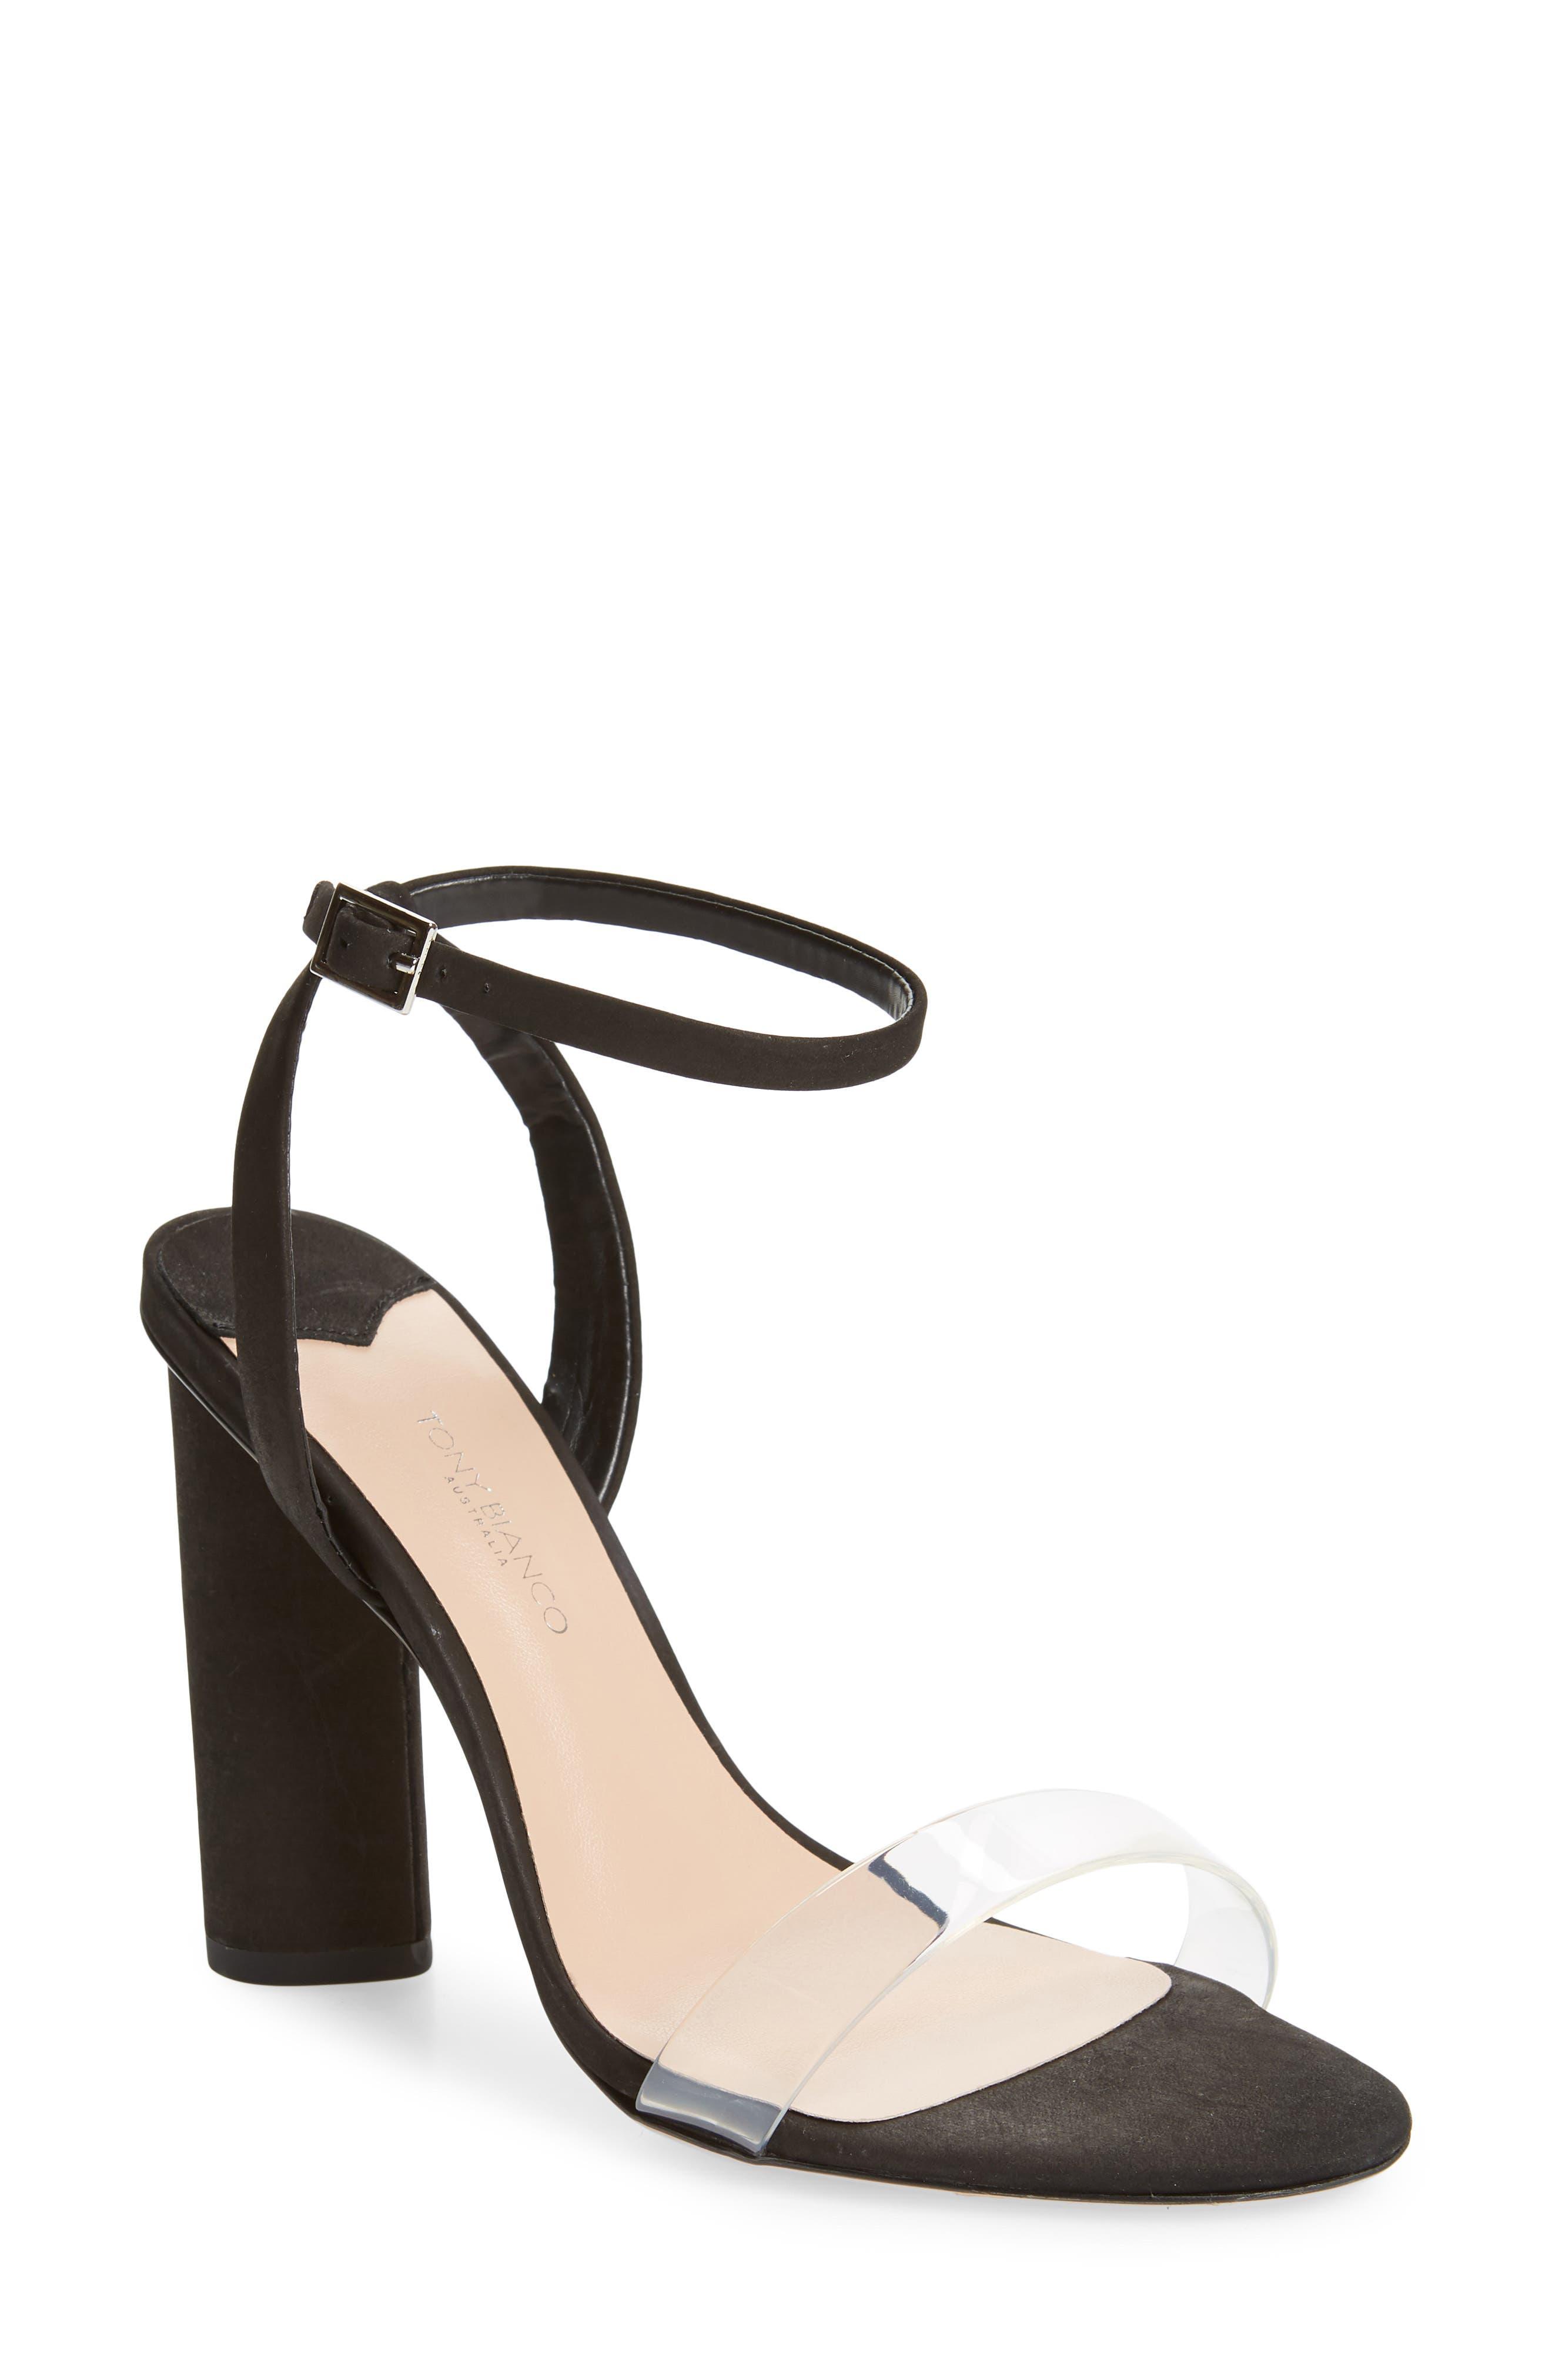 Tony Bianco Tommi Round Heel Sandal